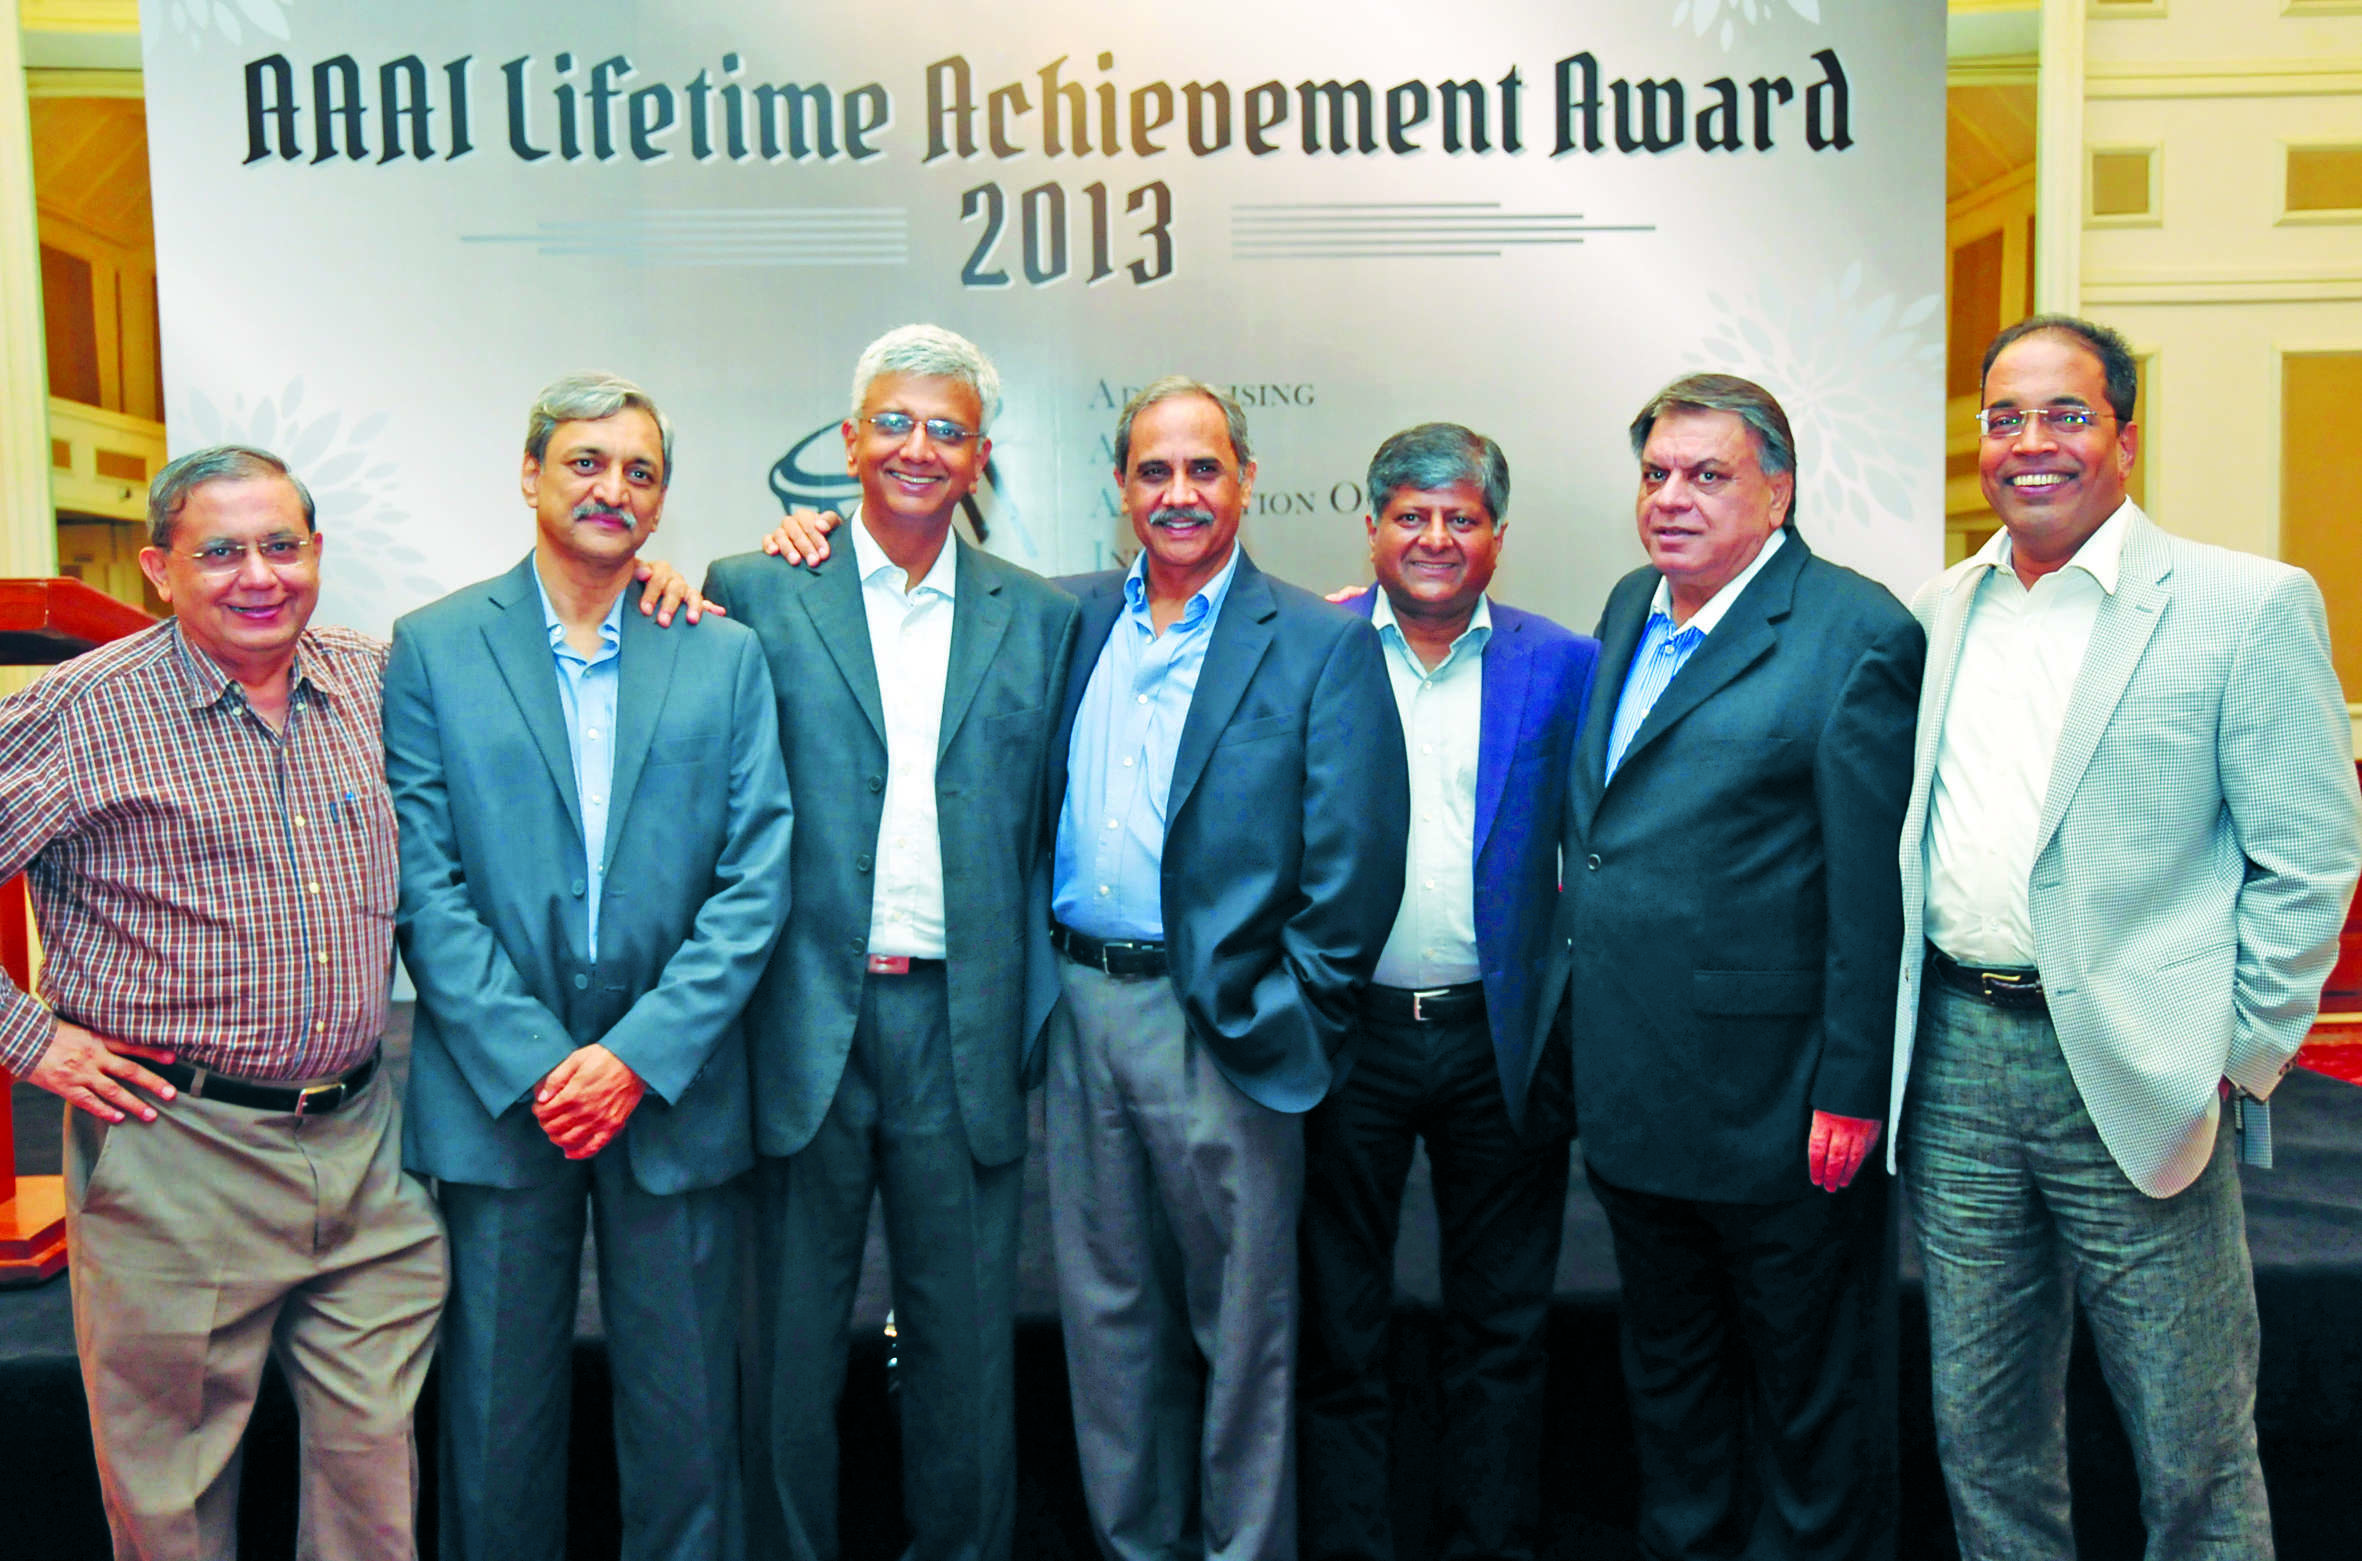 (De gauche à droite) Dorab Sopariwala, Nitin Bhagwat, Ambi Parameswaran, Arvind Wable, Shashi Sinha, Anil Kapoor et Nagesh Alai